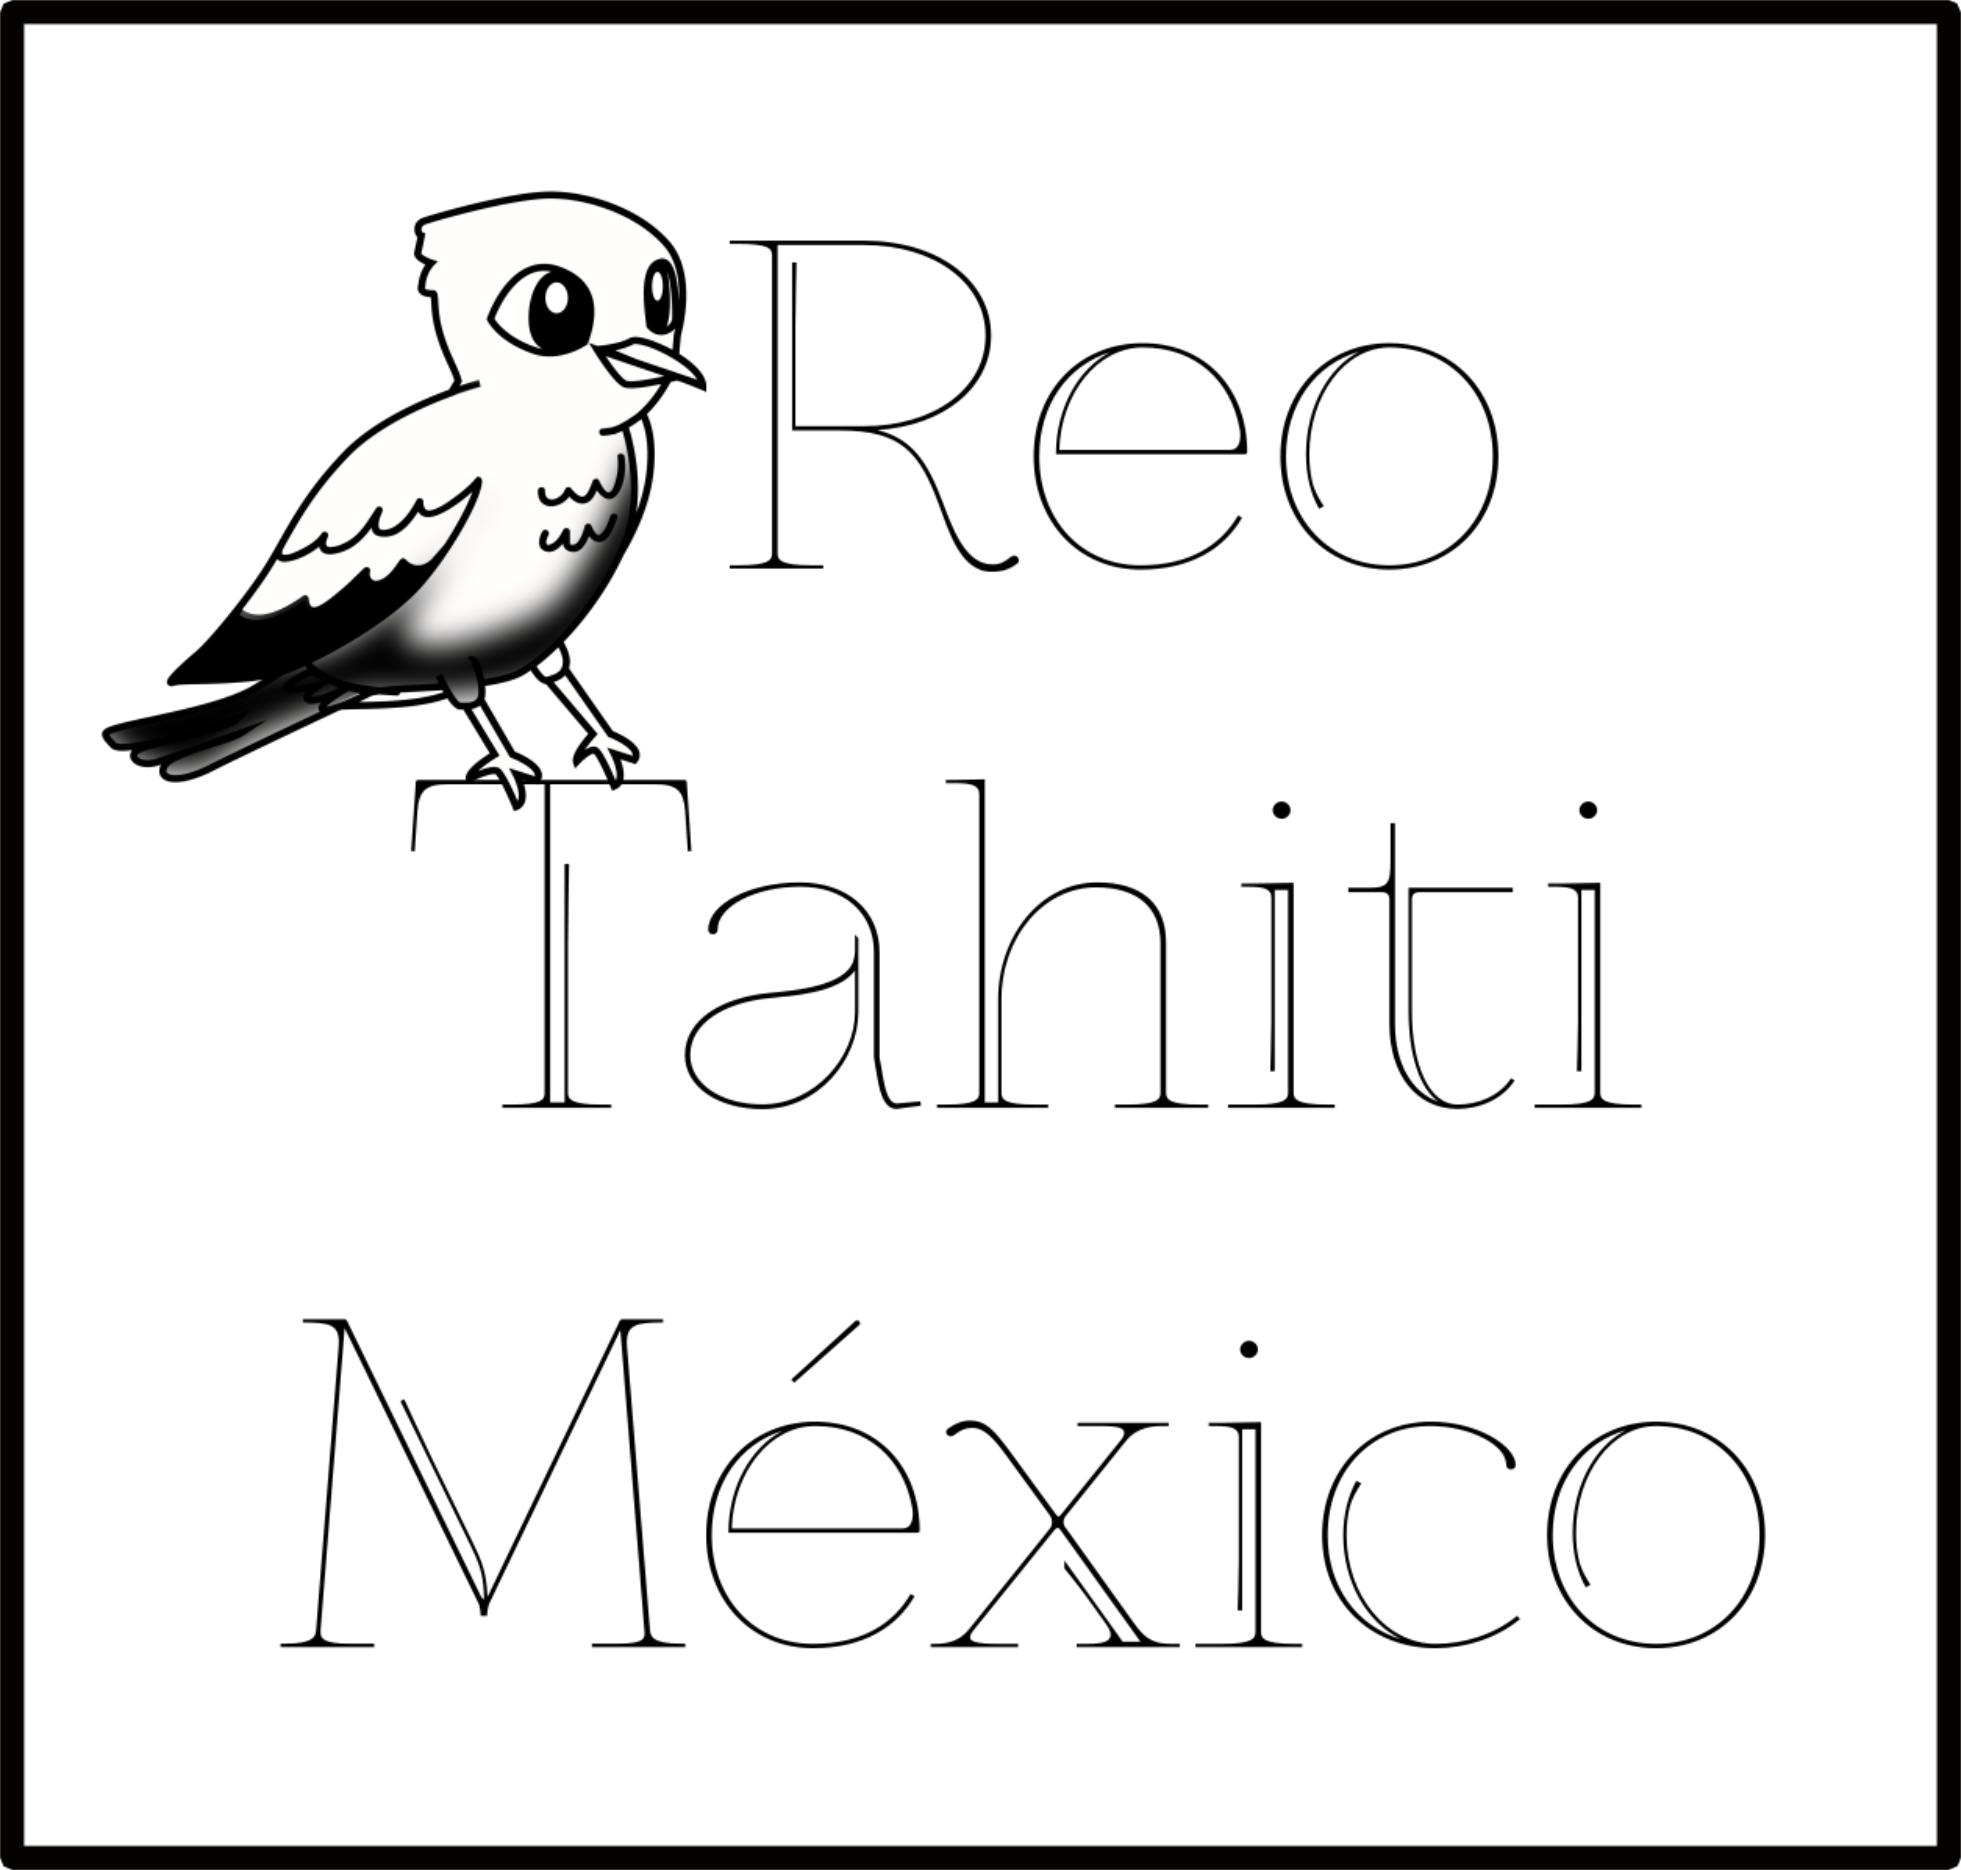 Reo Tahiti México